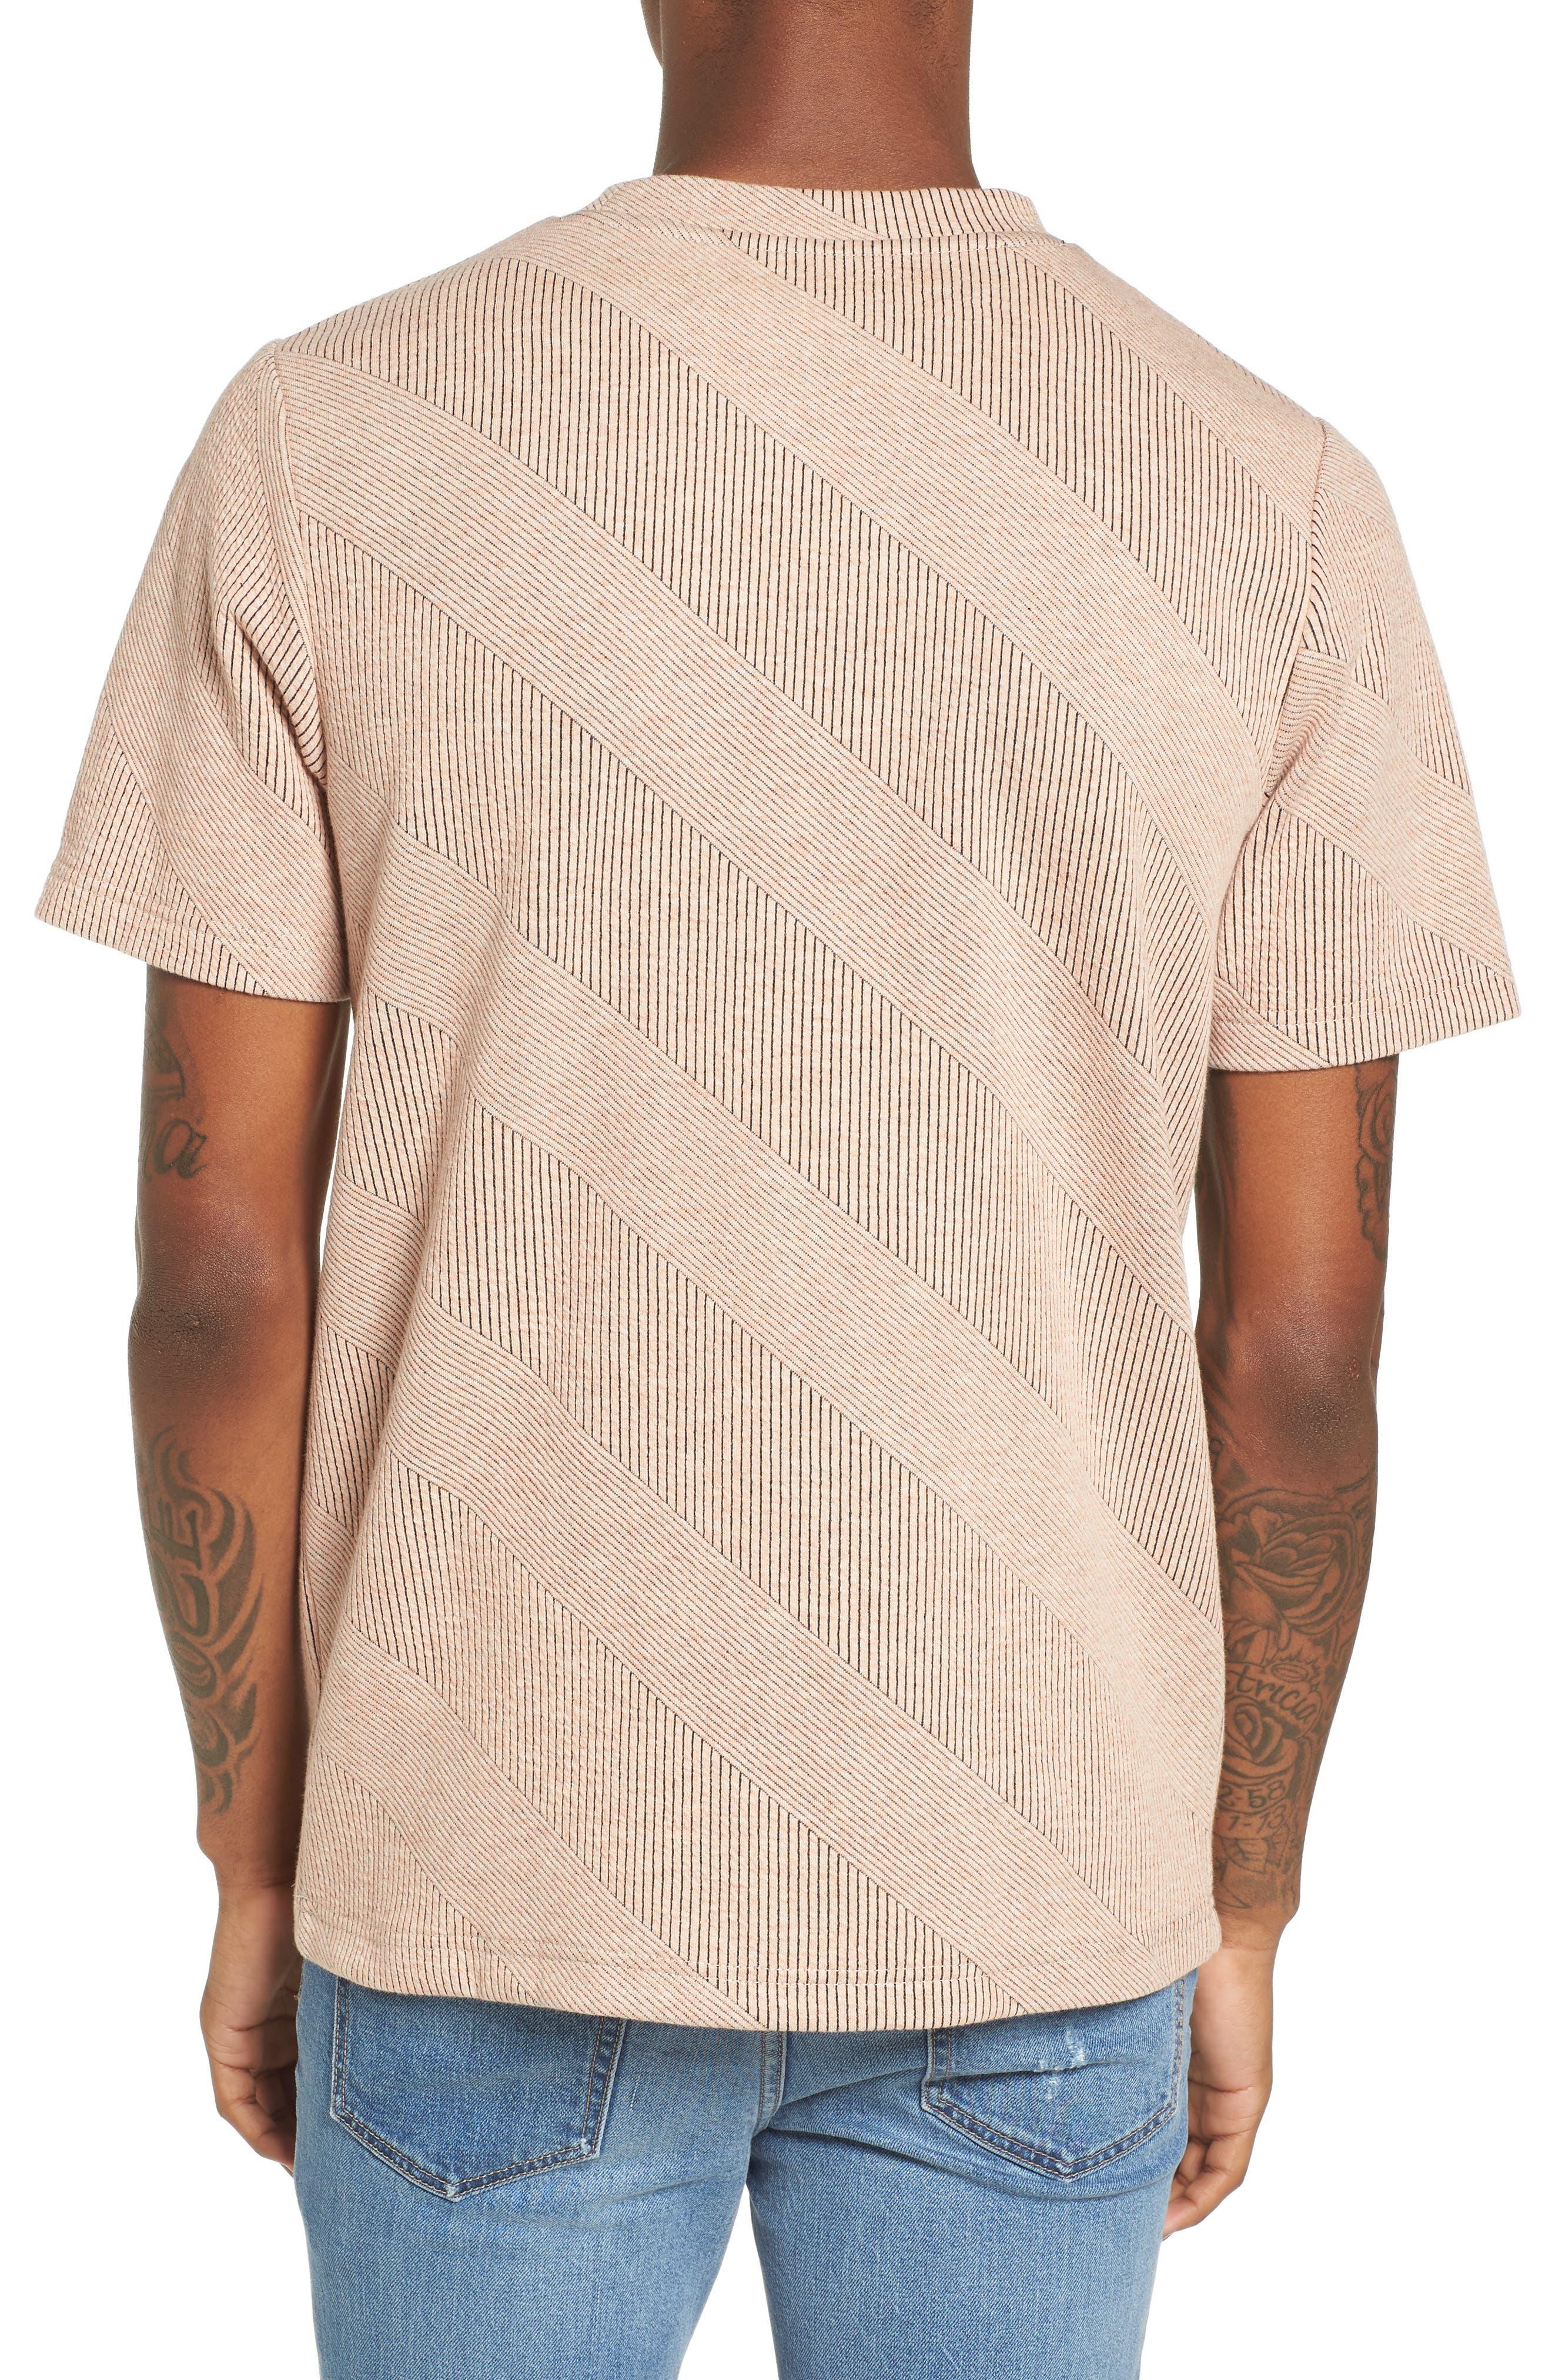 Biota T-Shirt,                             Alternate thumbnail 2, color,                             Coral